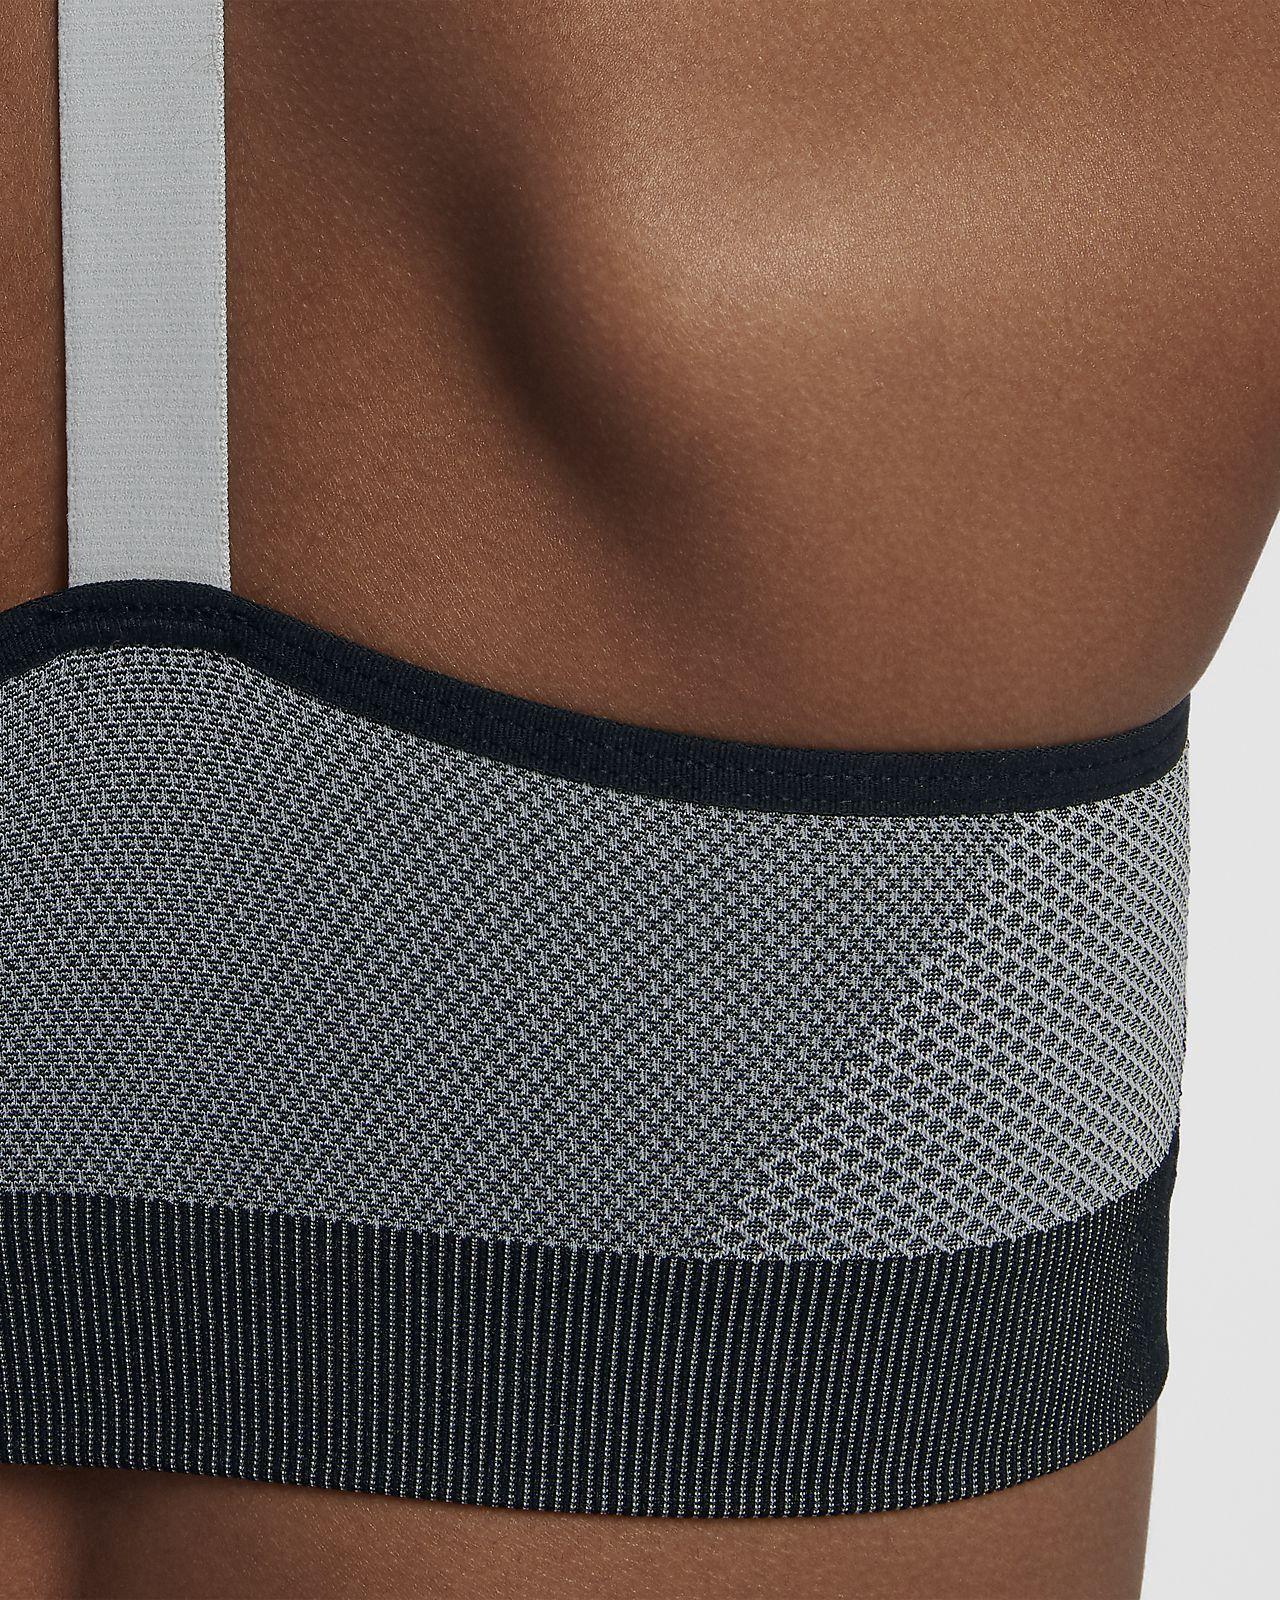 Nike Seamless Big Kids' (Girls') Sports Bra - M (10-12 ...